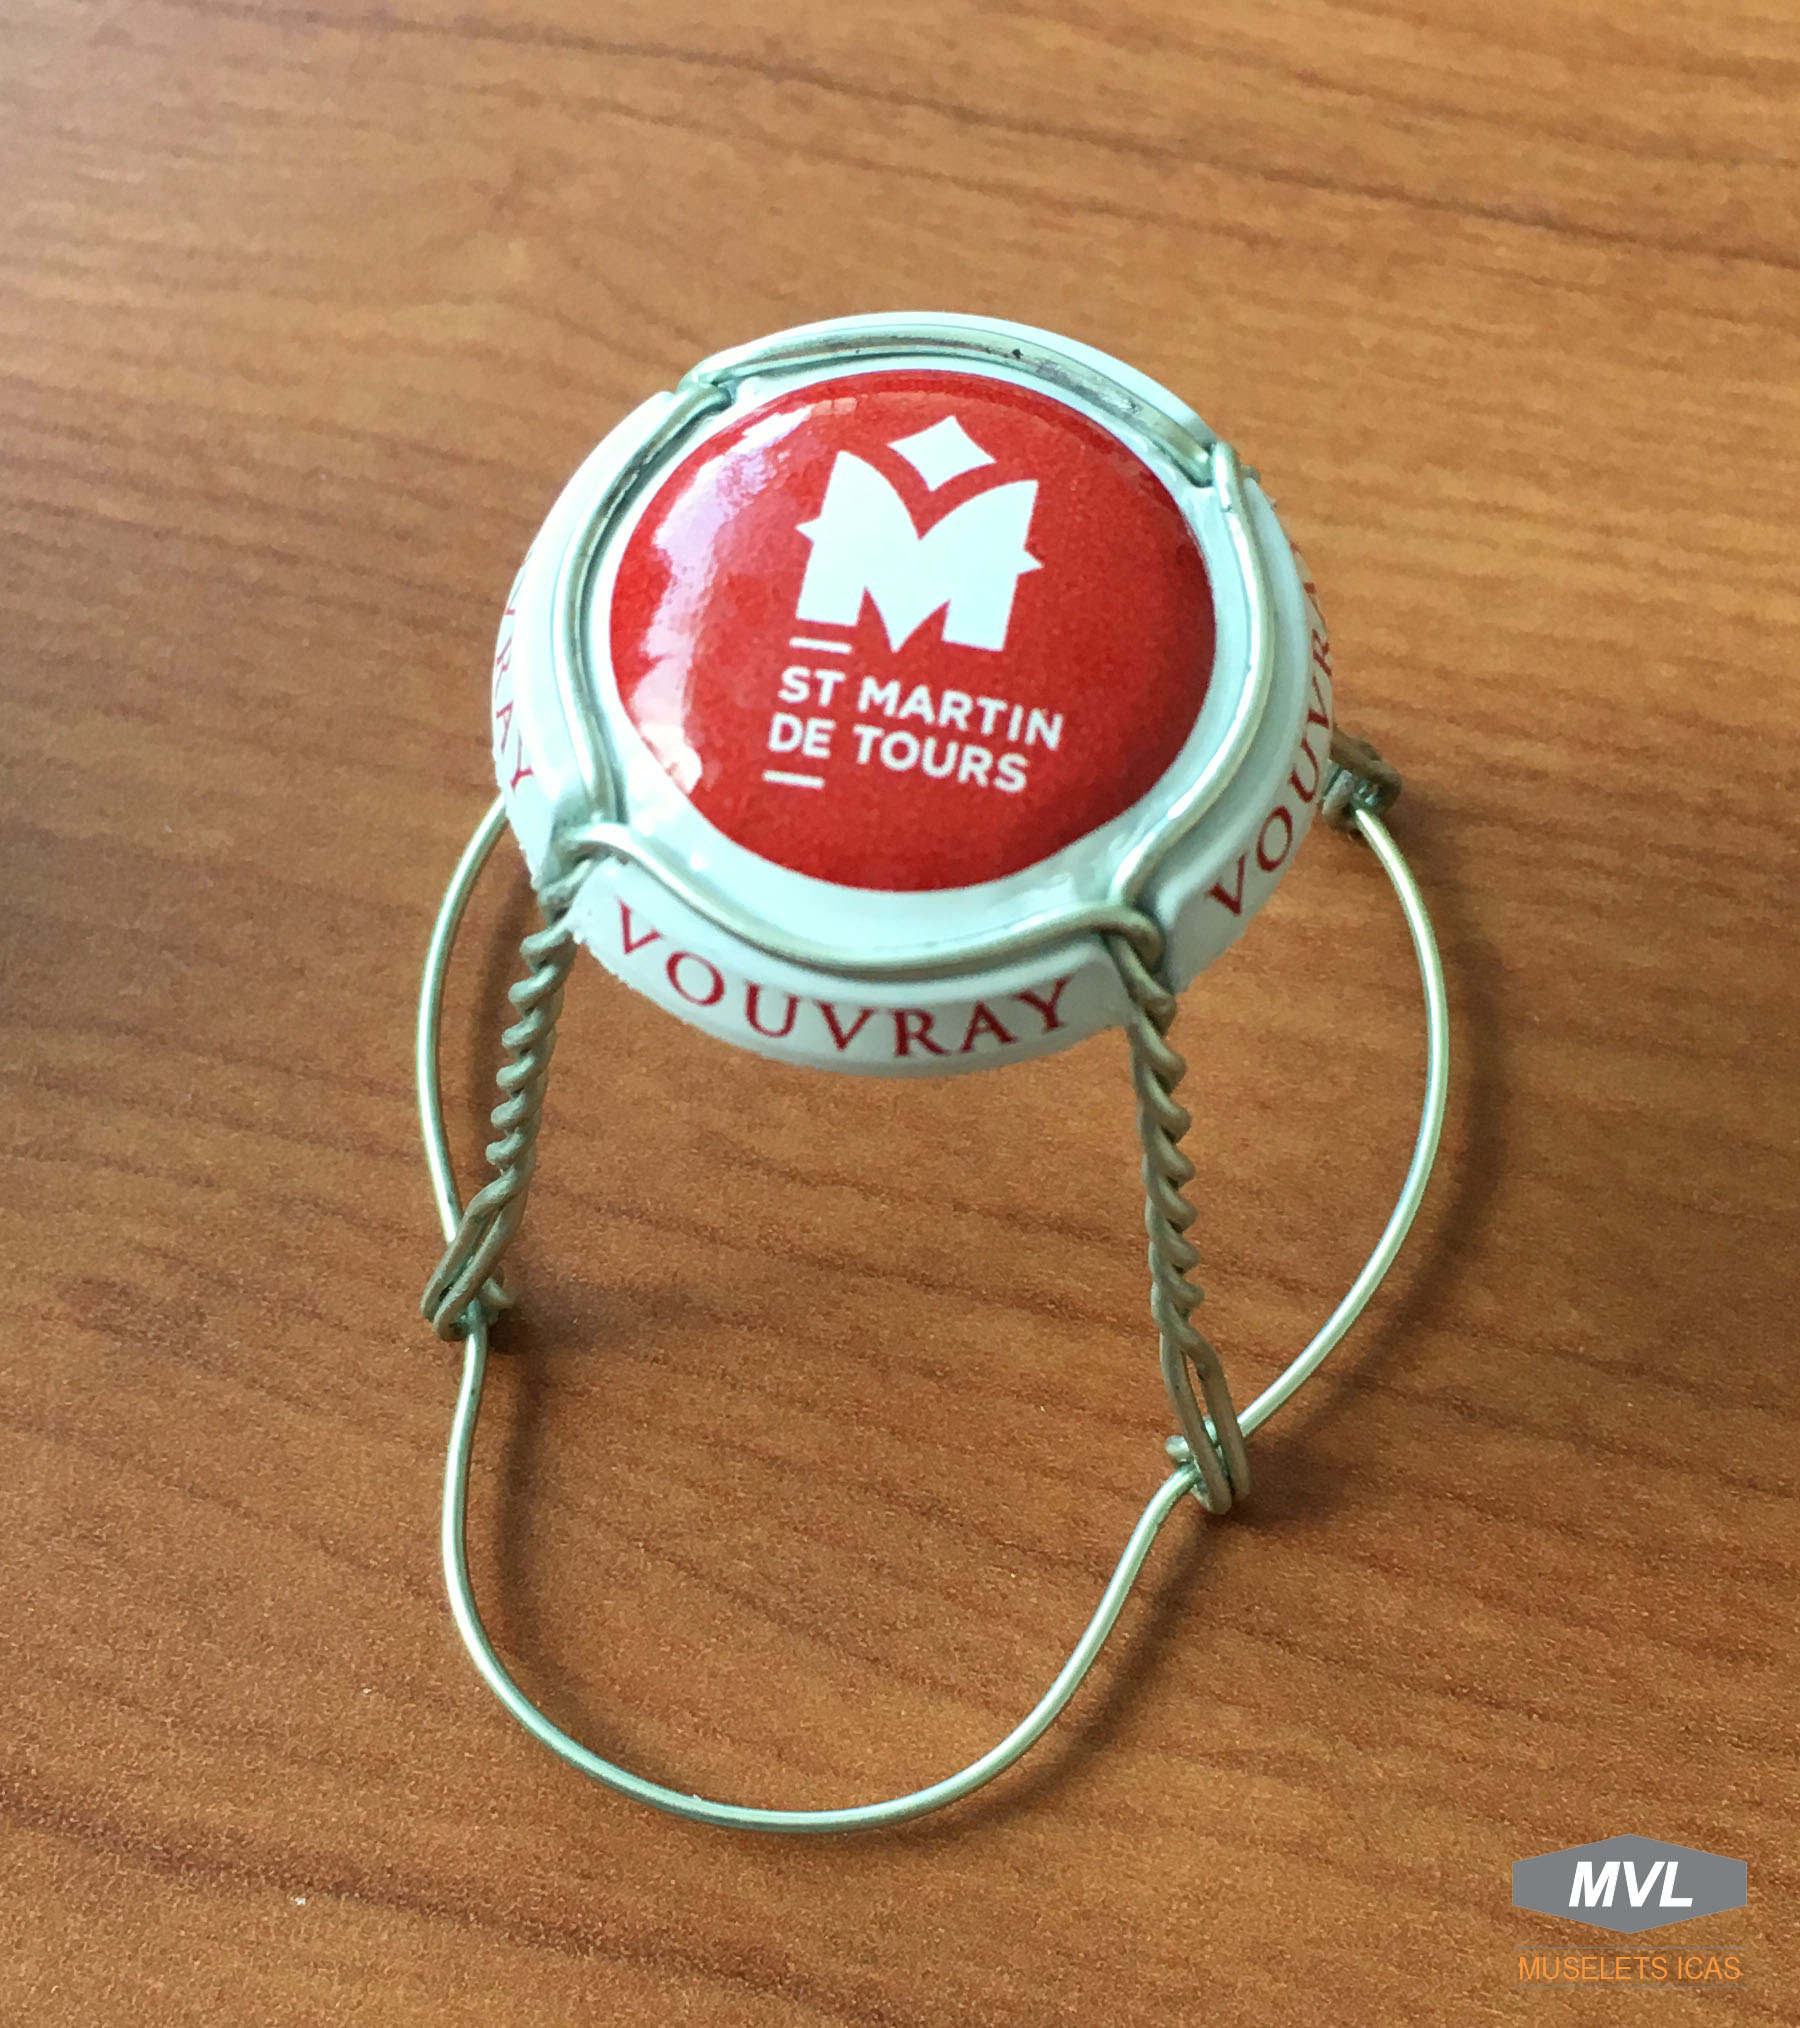 MVL - MUSELET ST MARTIN